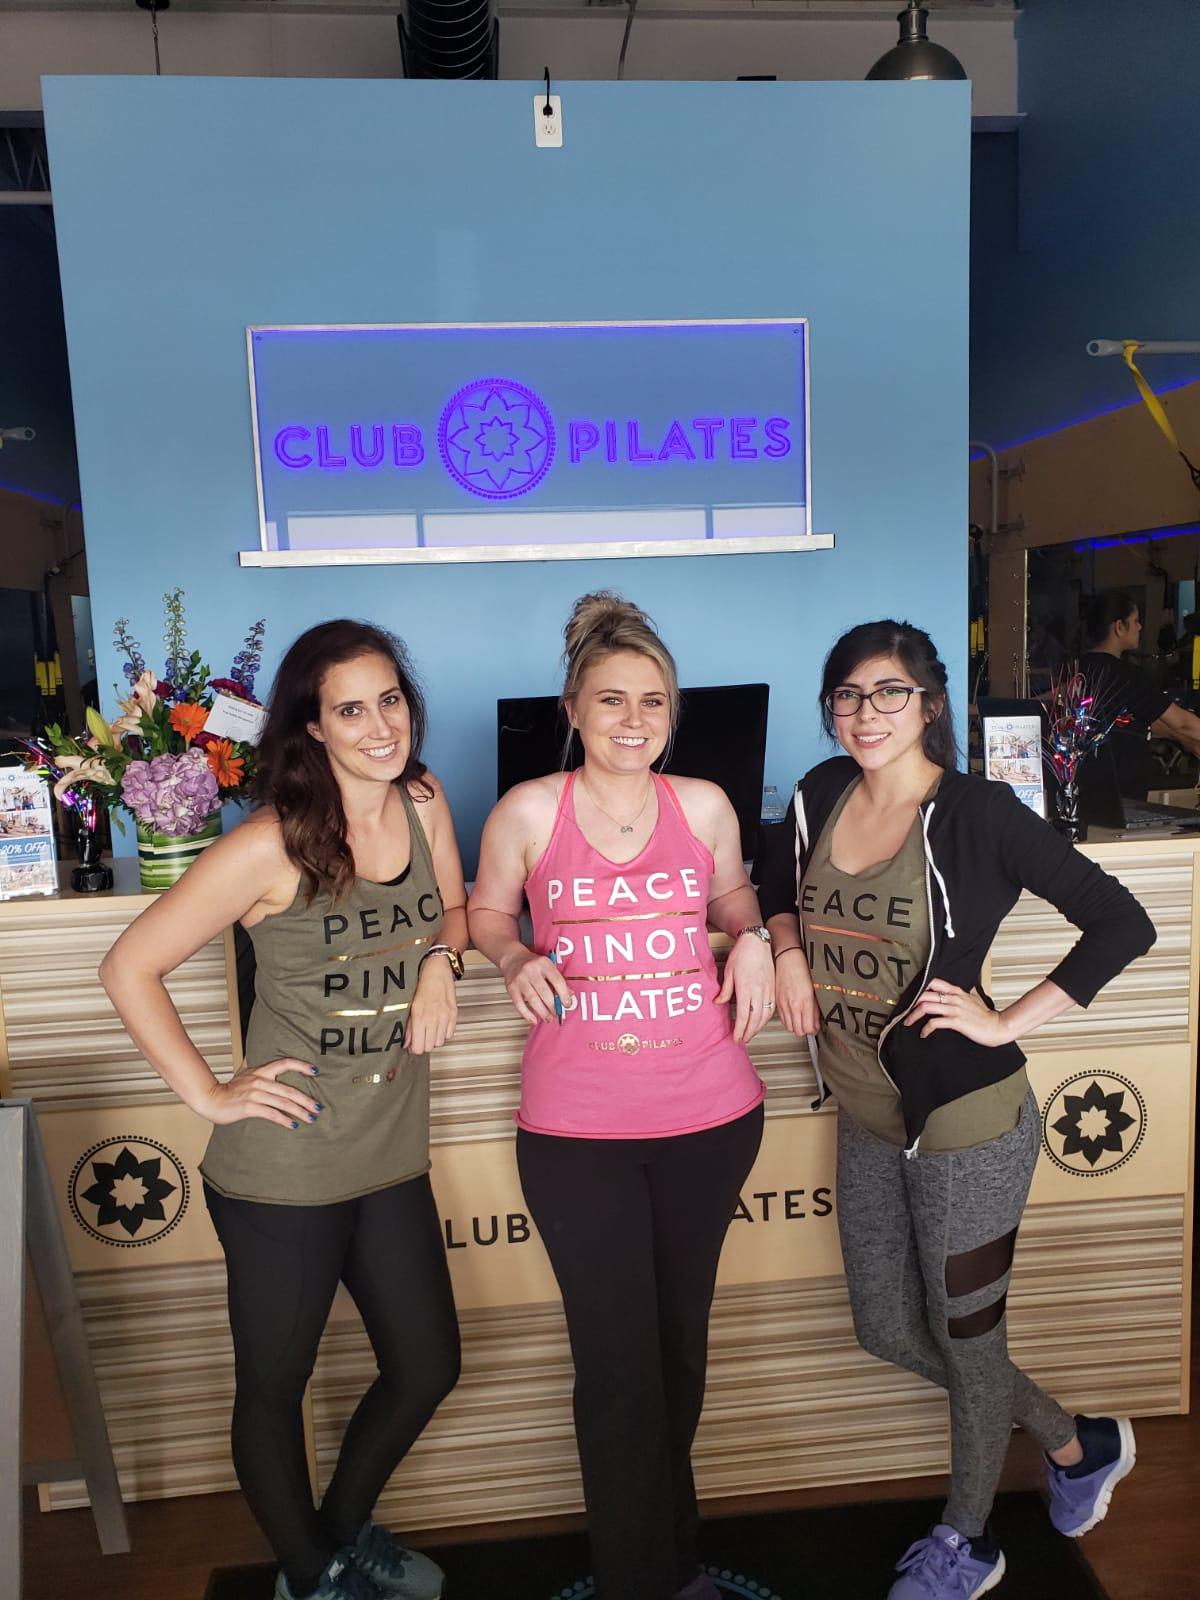 Club Pilates image 3